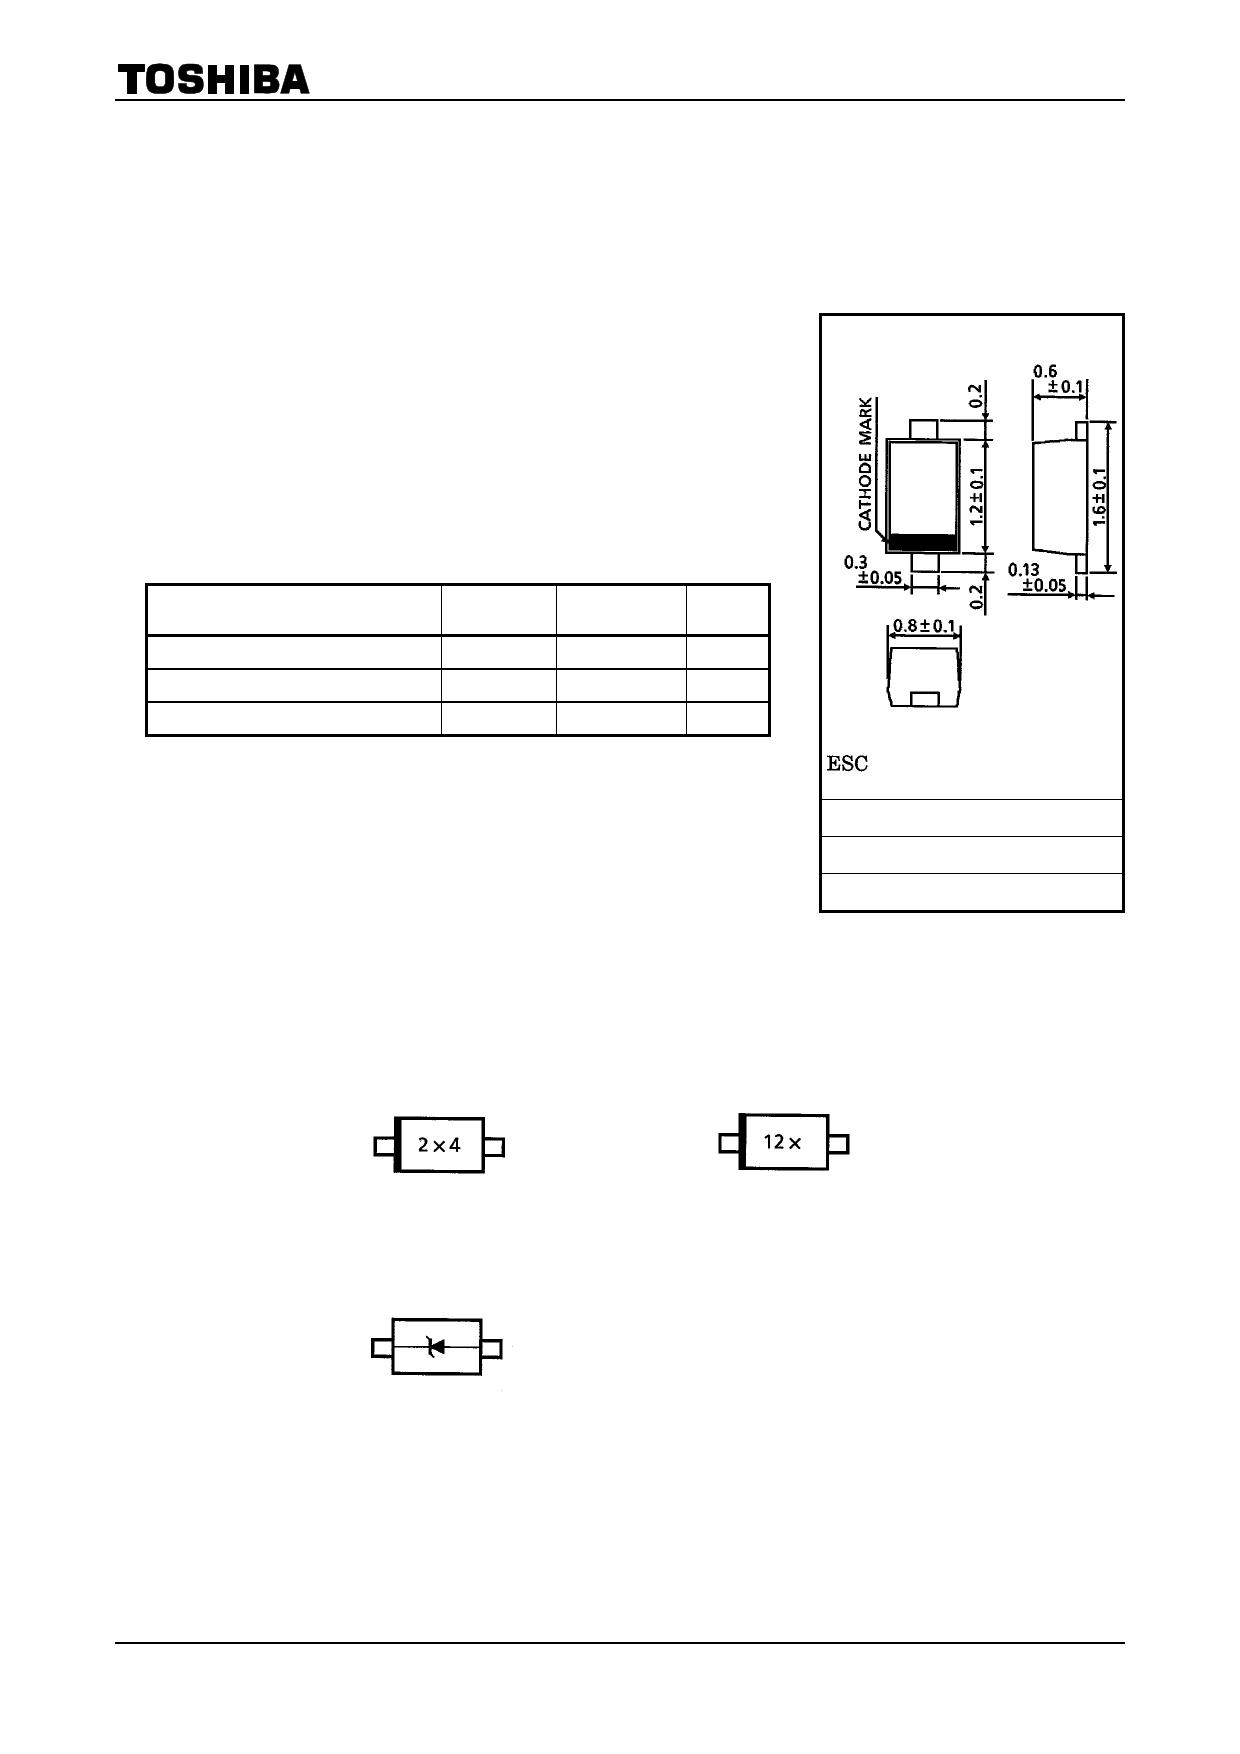 015AZ2.0 datasheet